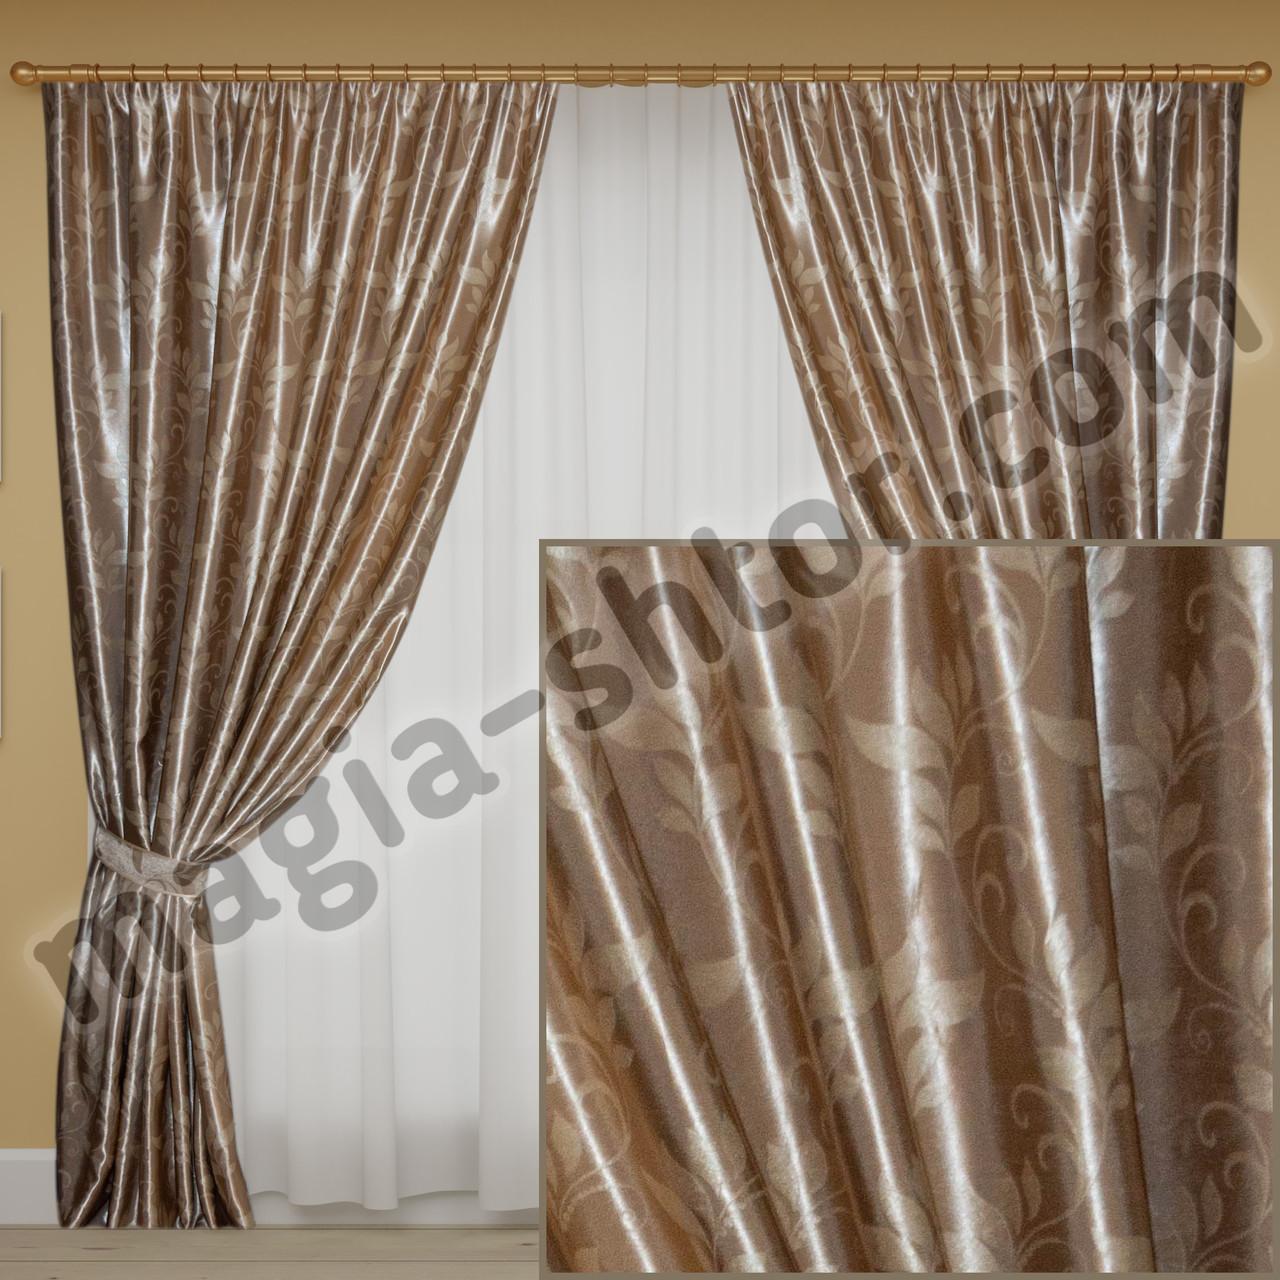 Бежевые шторы в зал, коллекция блэкаут